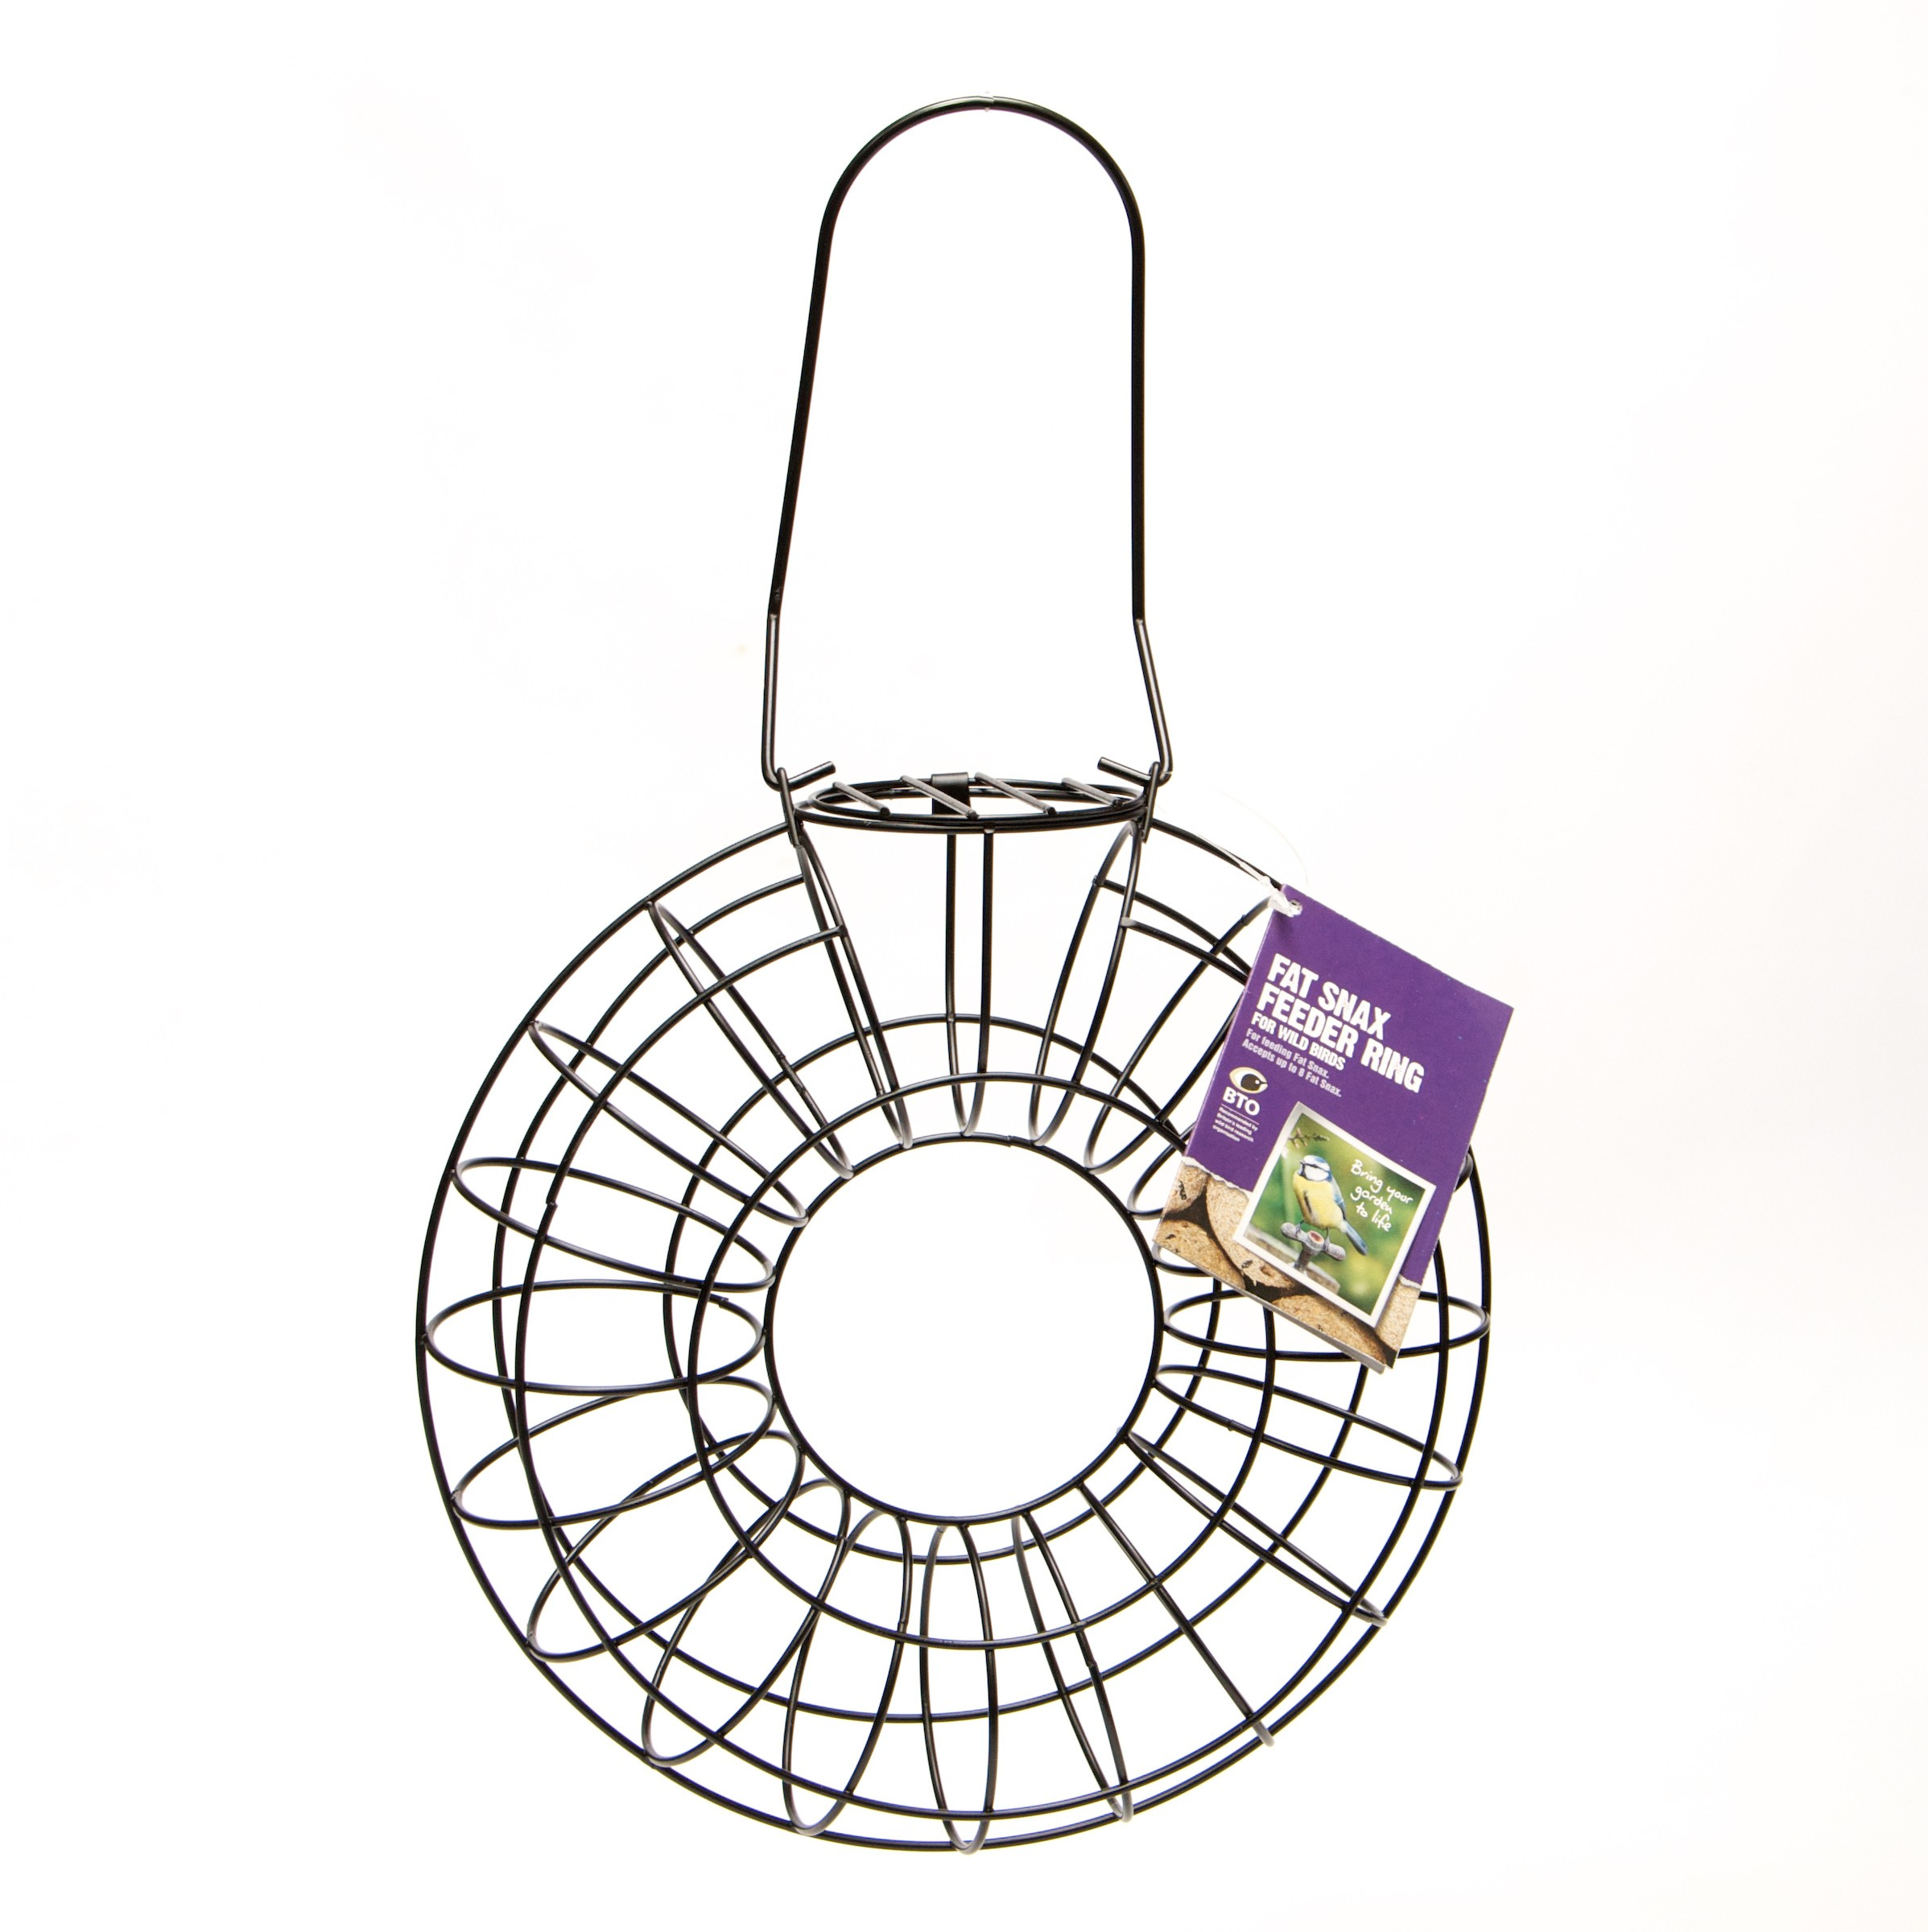 2395x2400 Fat Ball Birdfeeder Ring Buy Online